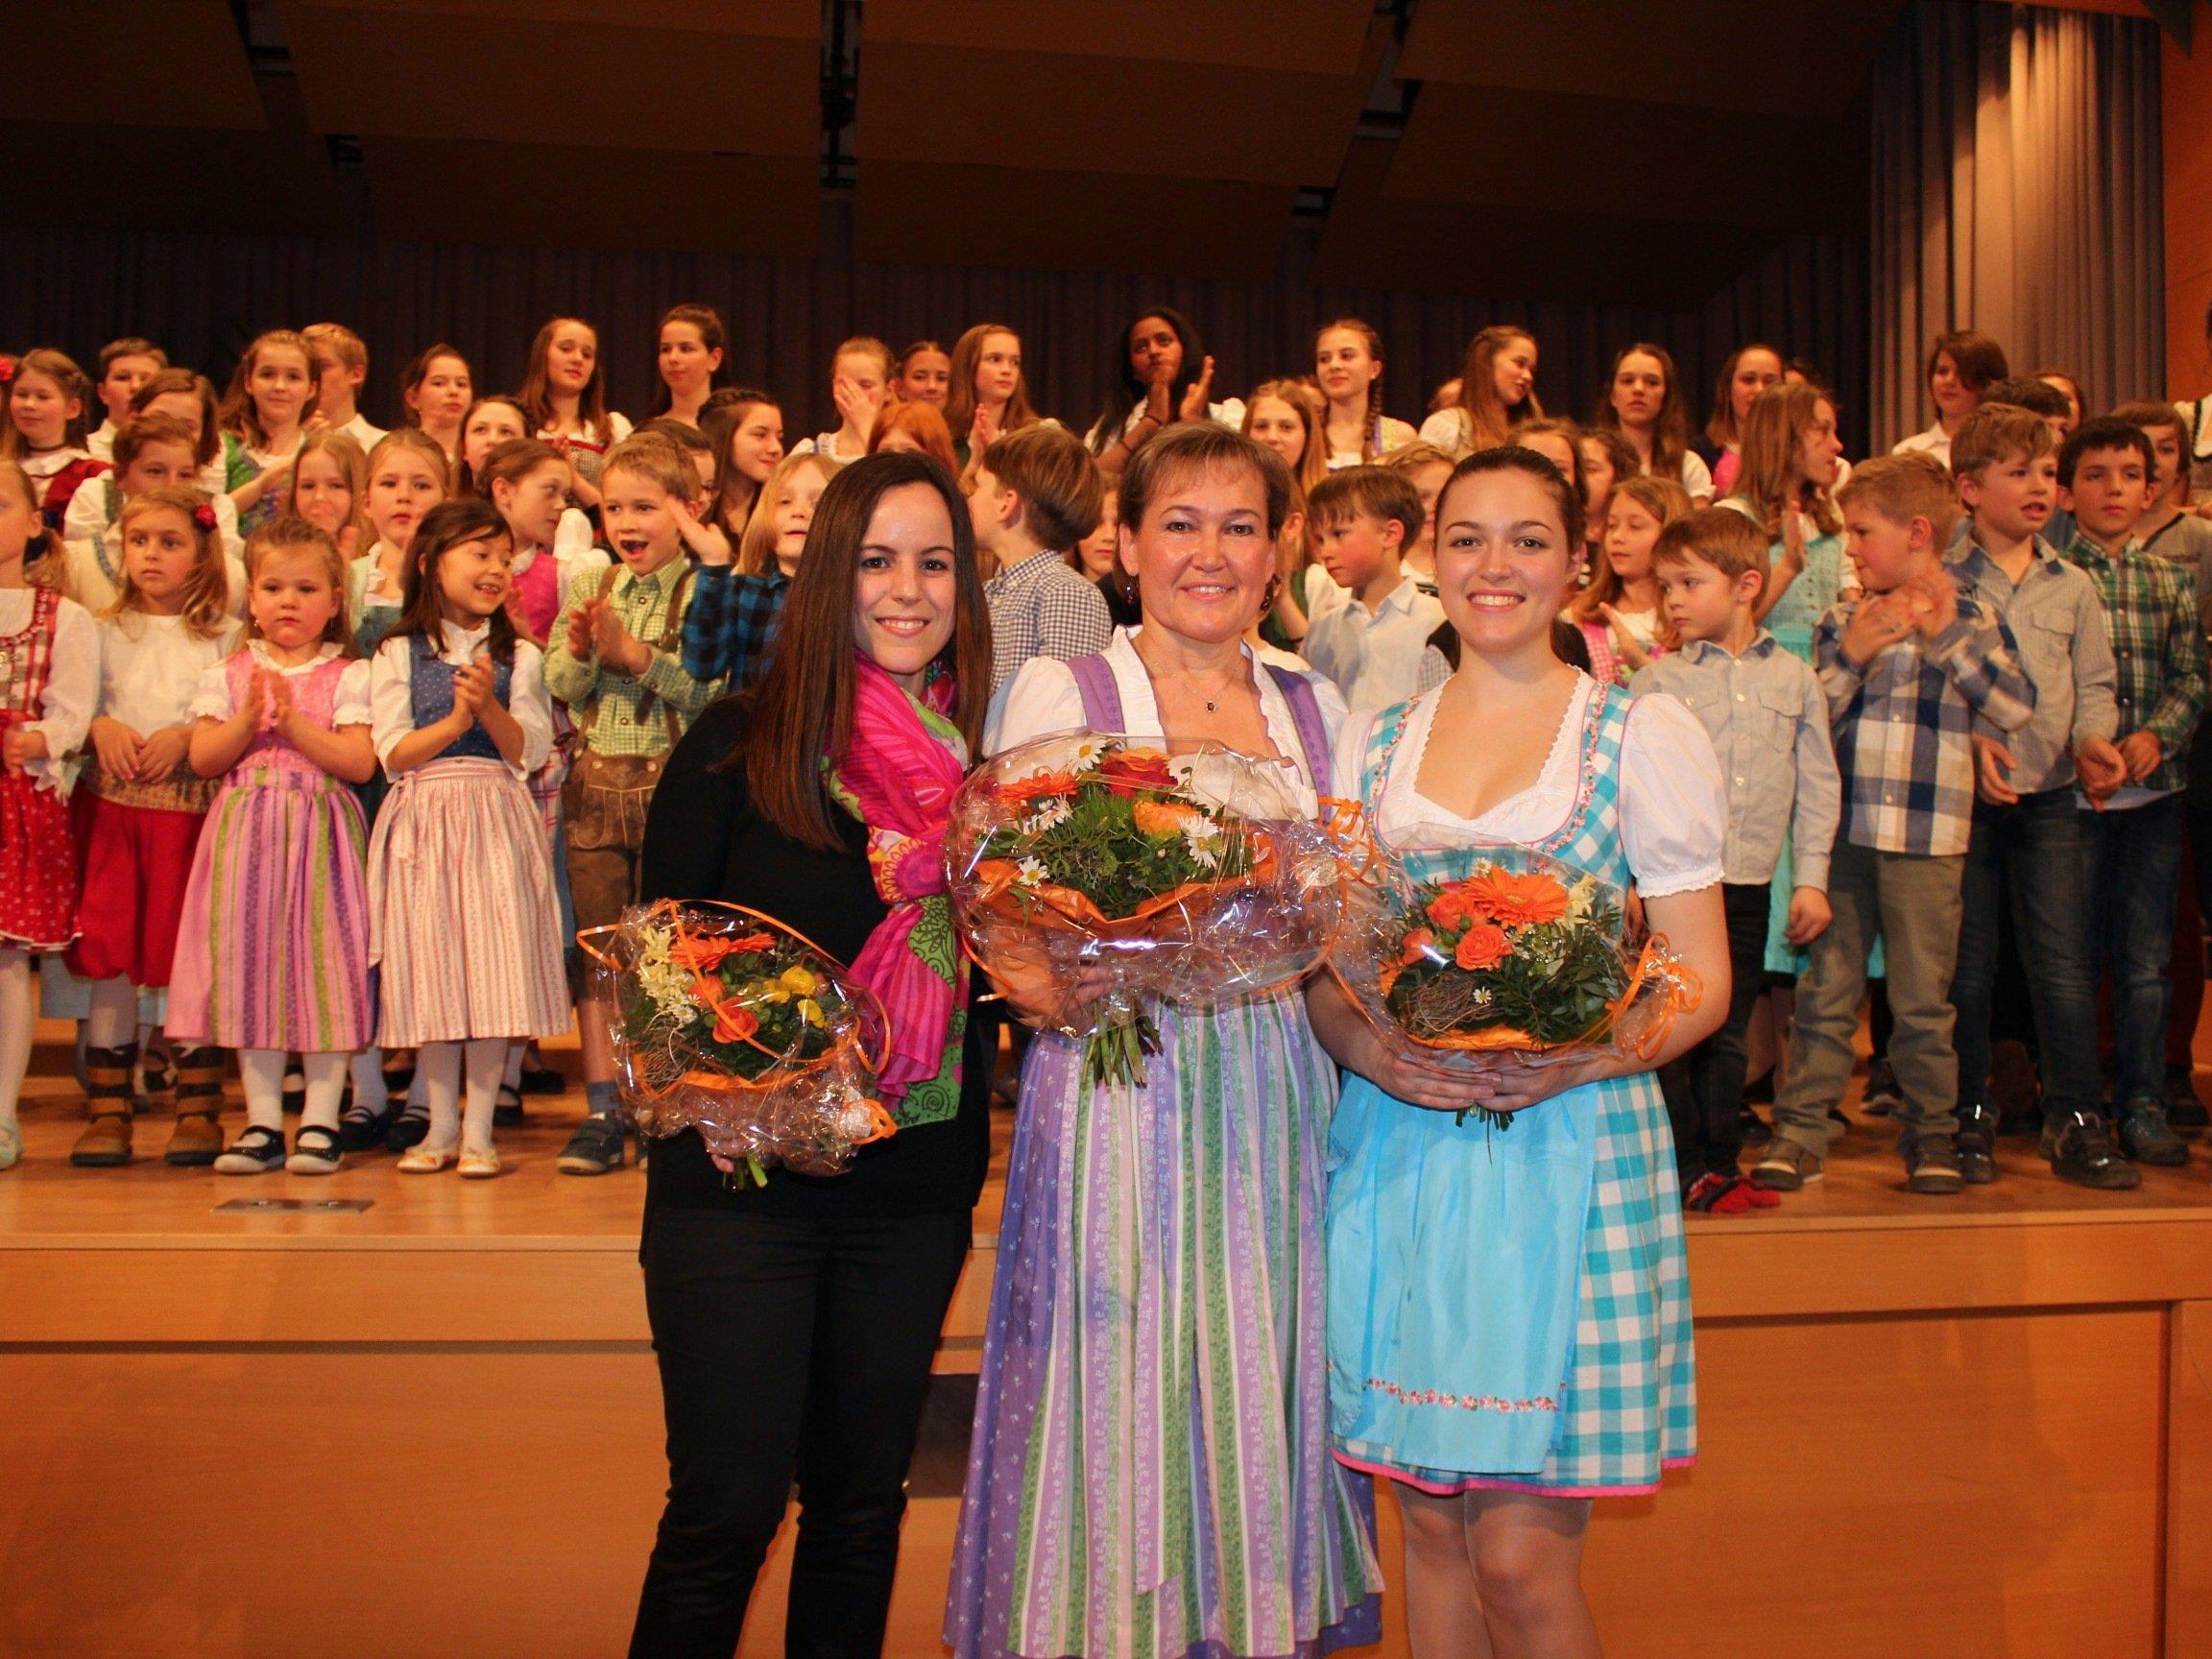 Desirée Metzler, Birgit Giselbrecht-Plankel und Clara Böhler.